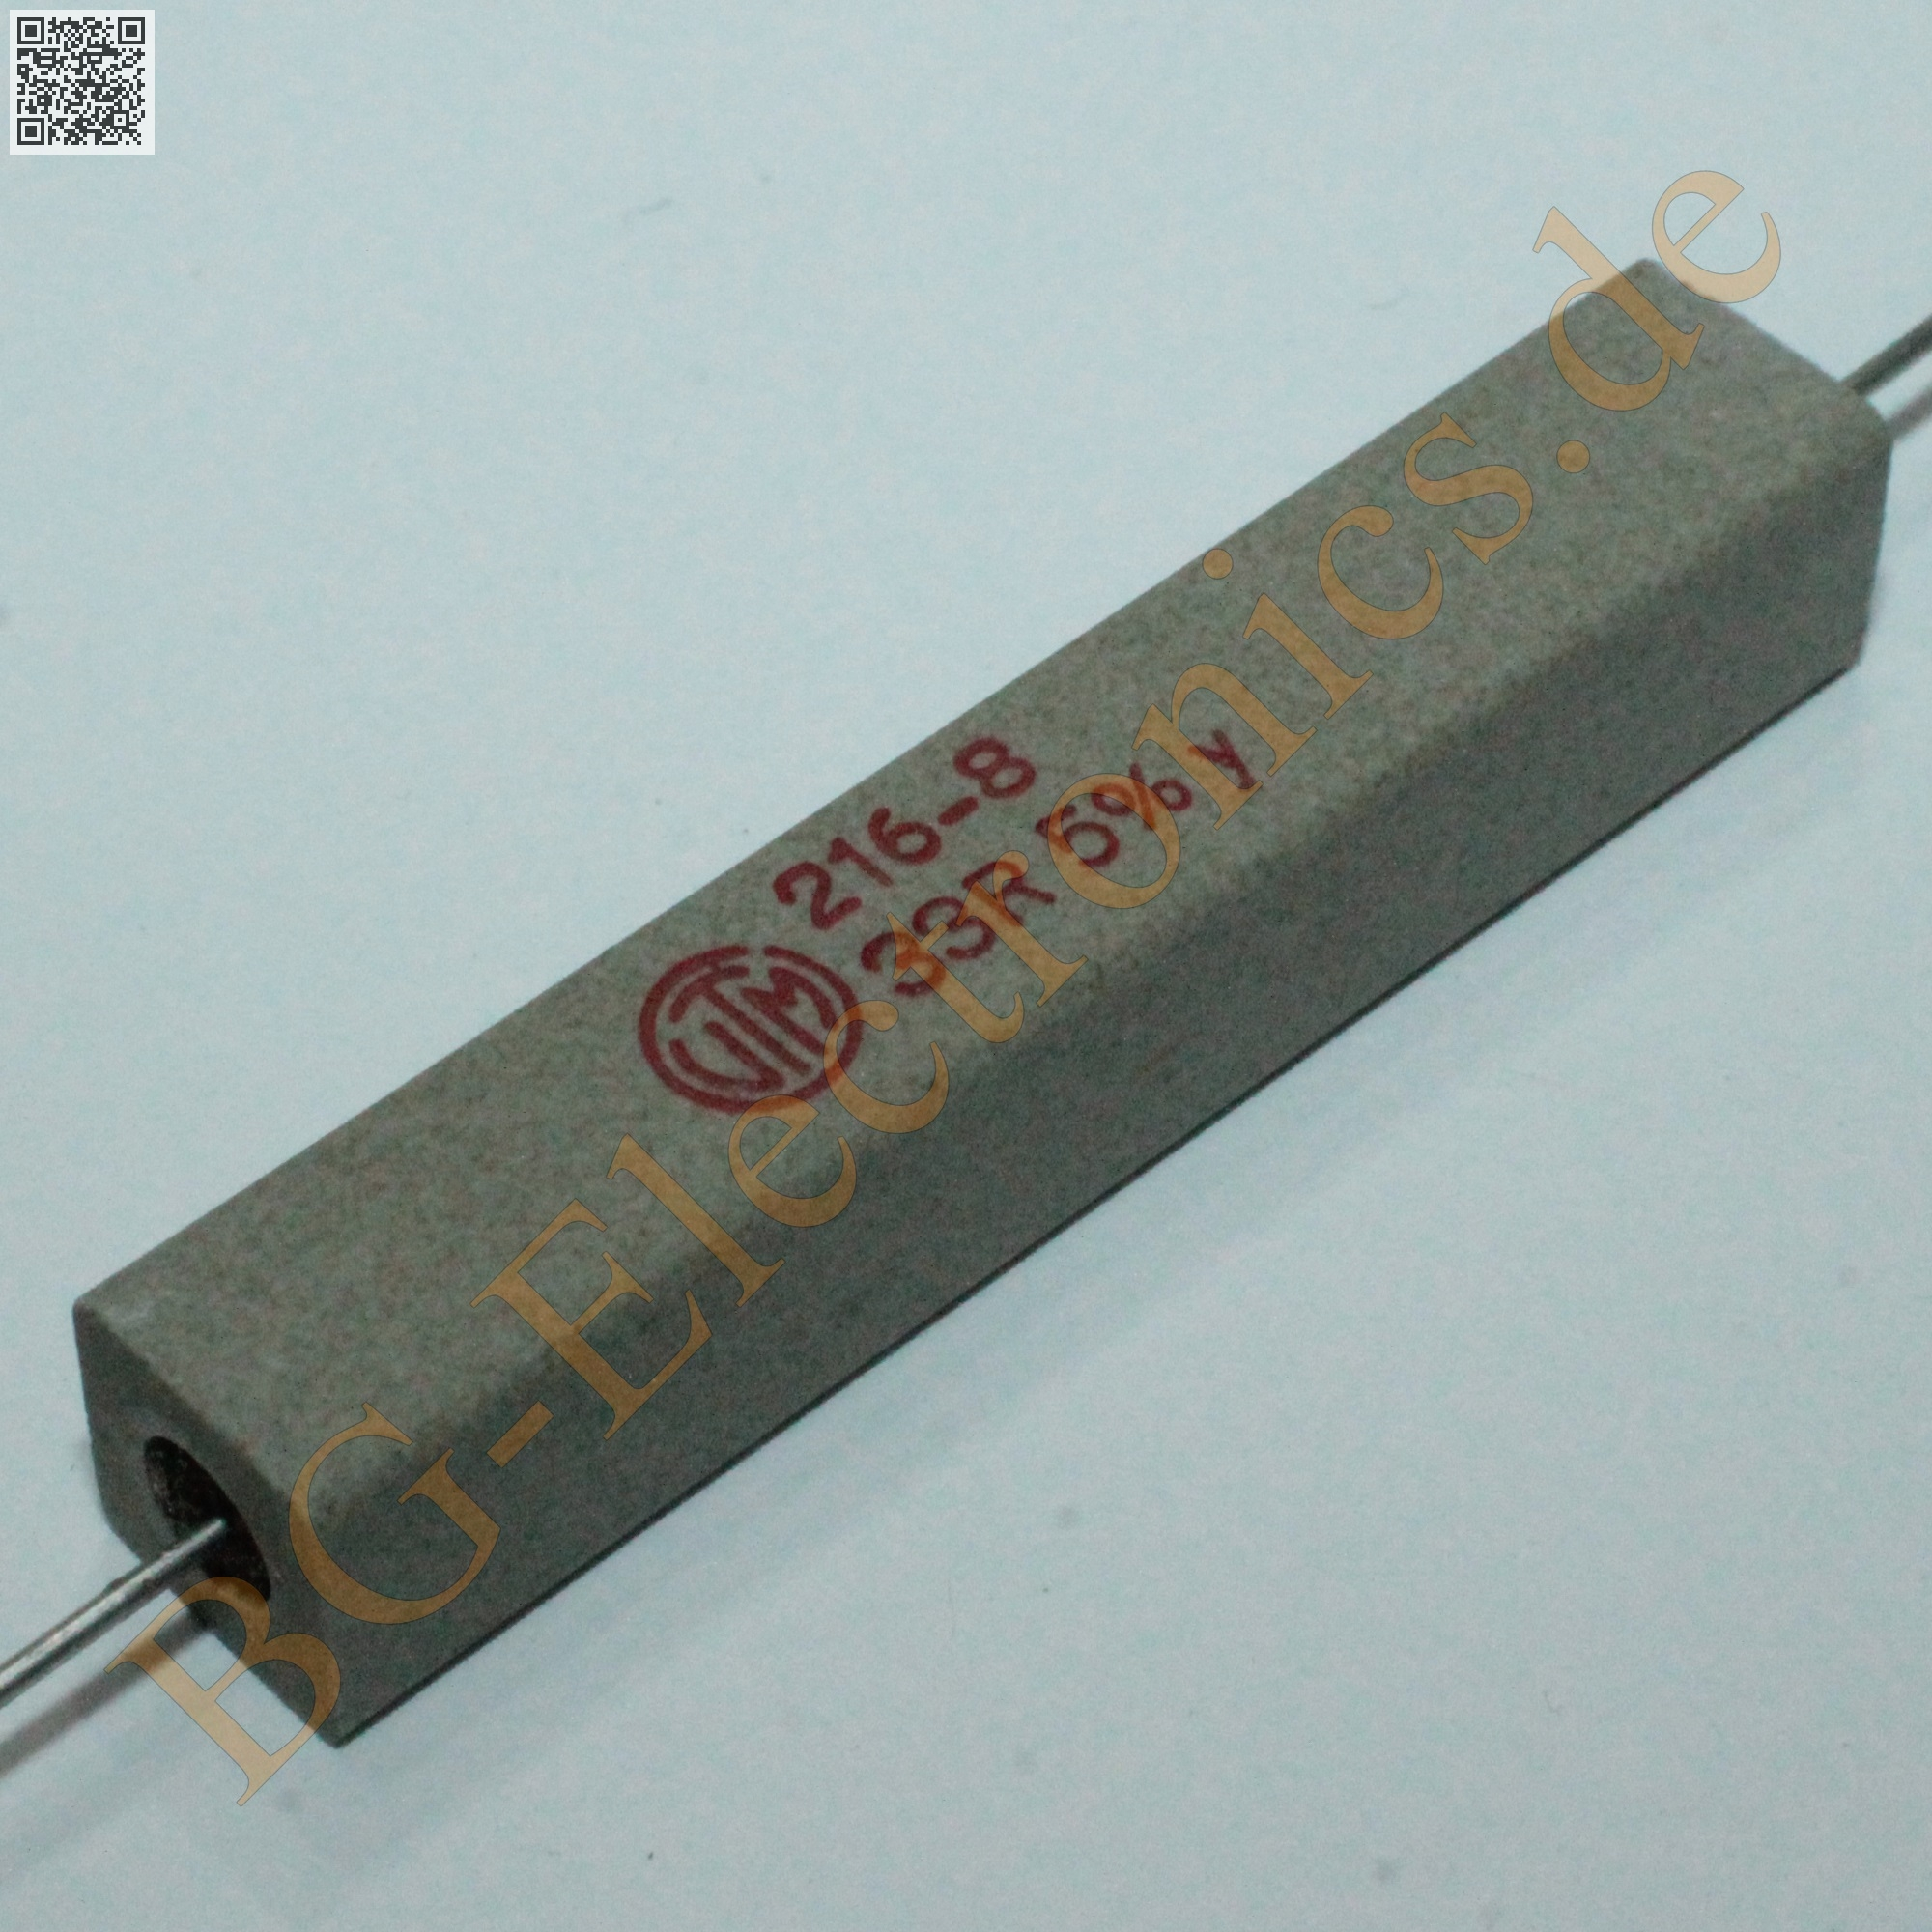 2 x 33 11w 33ohm widerstand resistor vitrohm 2pcs ebay. Black Bedroom Furniture Sets. Home Design Ideas